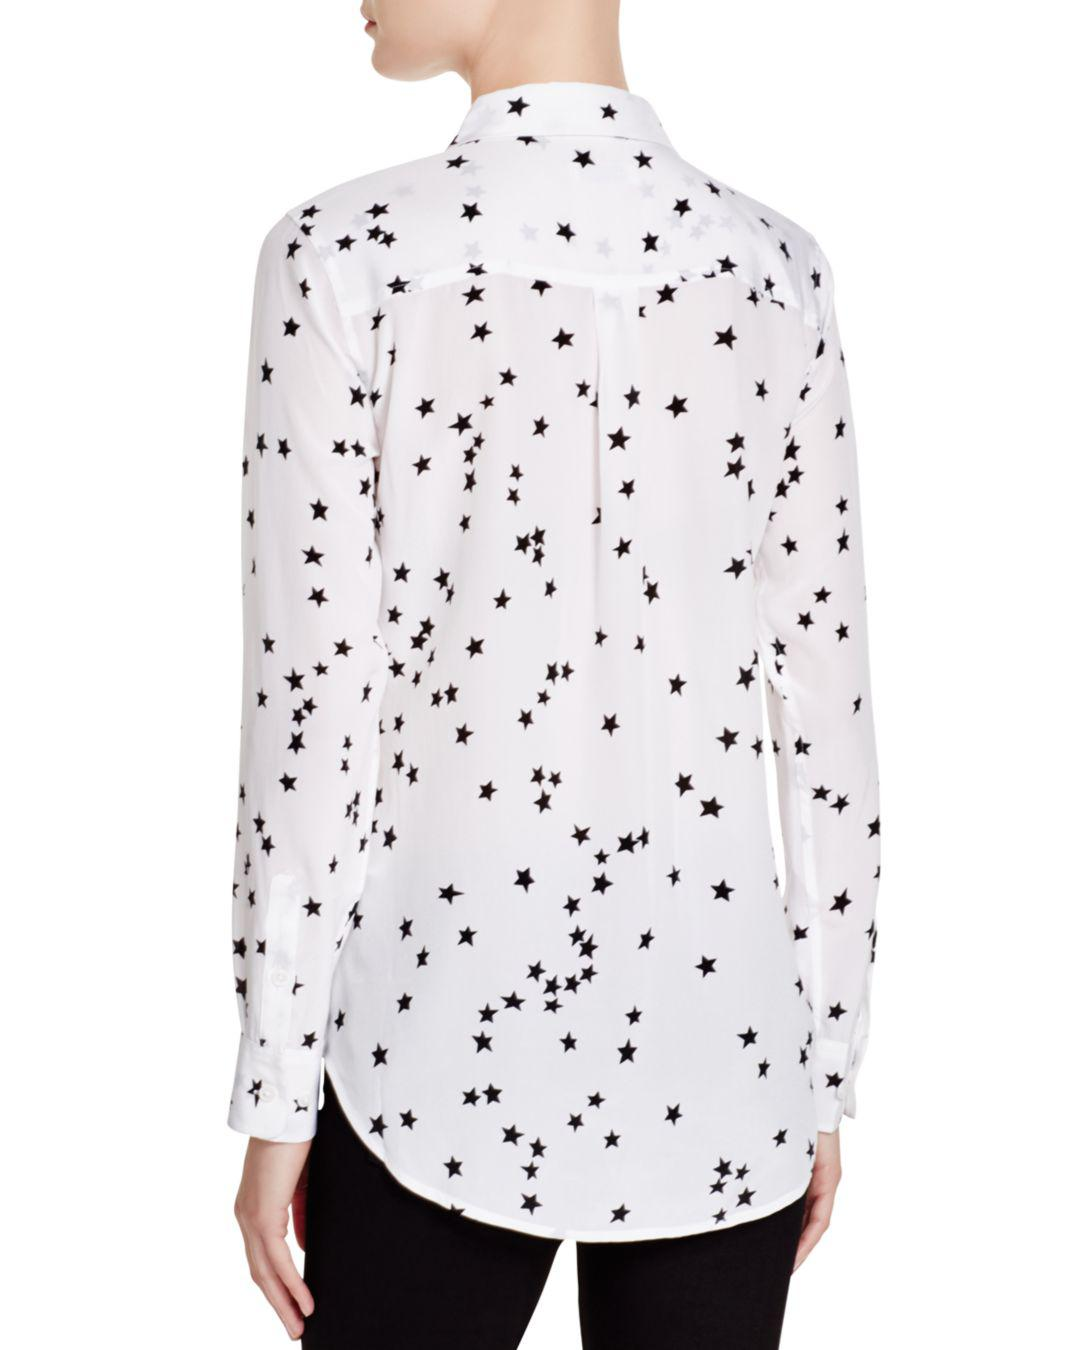 29246c2758505 Equipment  slim Signature  Star Print Silk Shirt in White - Save  56.58914728682171% - Lyst